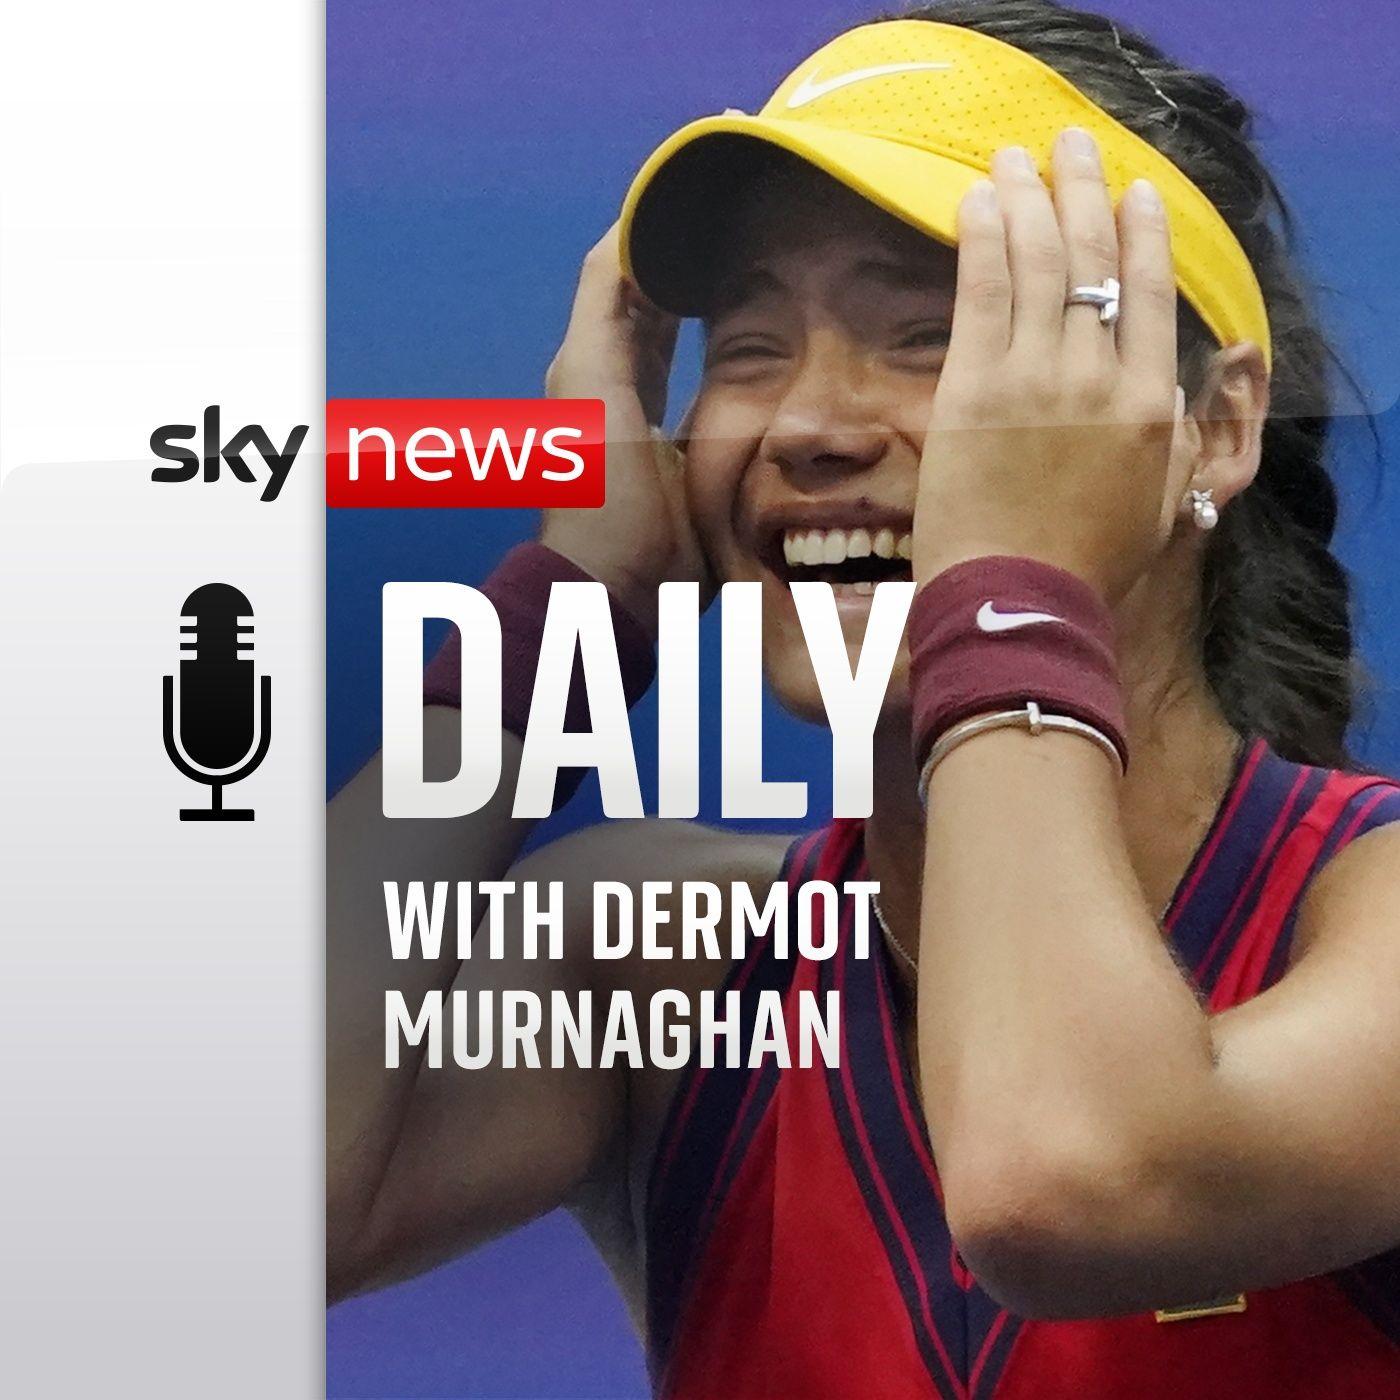 Emma Raducanu: The story of the teenage tennis superstar